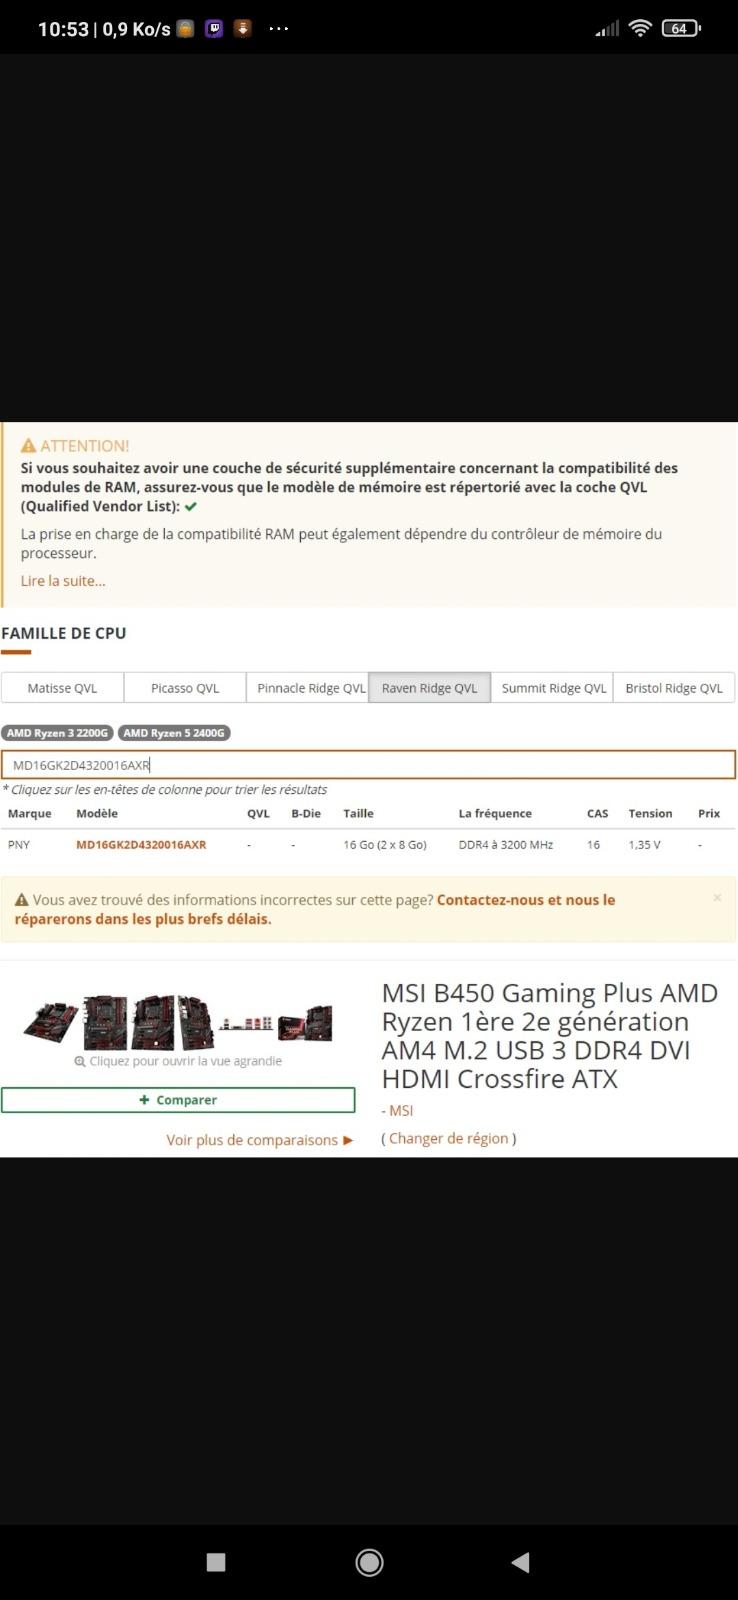 Screenshot_2021-01-31-10-53-07-958_com.msicommunity.webview.jpg